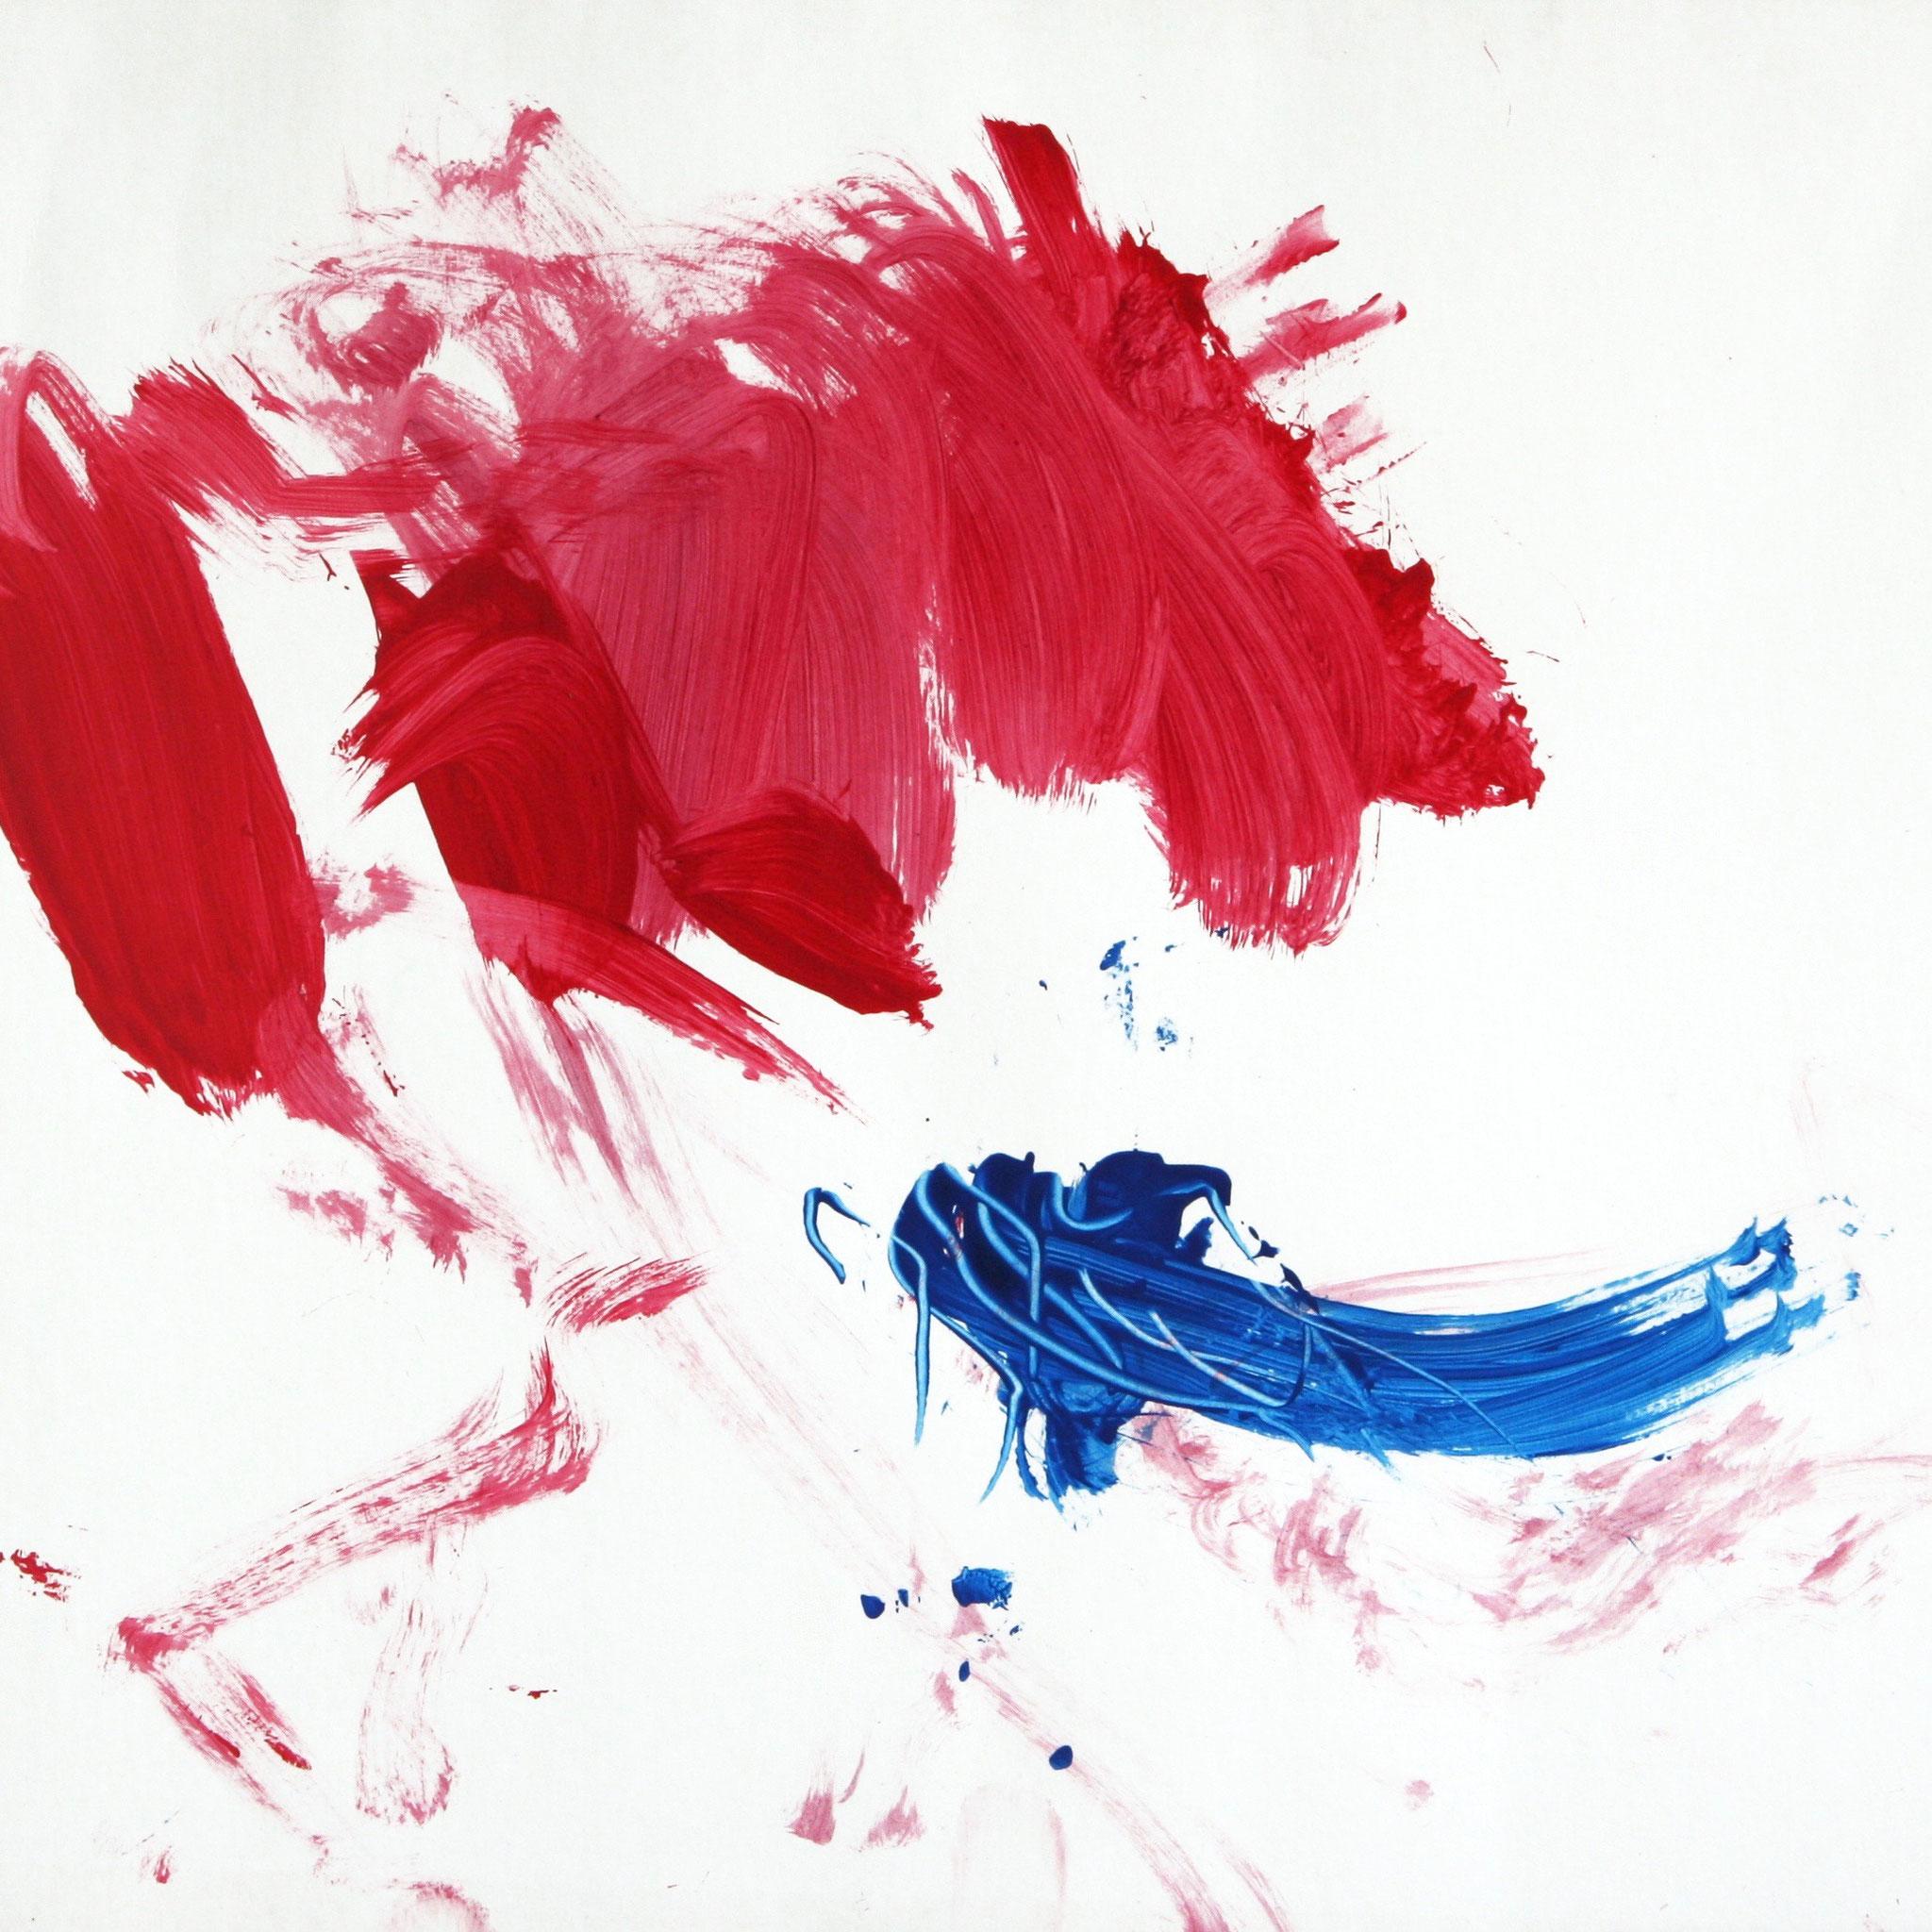 Sandra 0028, 2006, Fingerfarbe auf Pappe, 45 x 62 cm